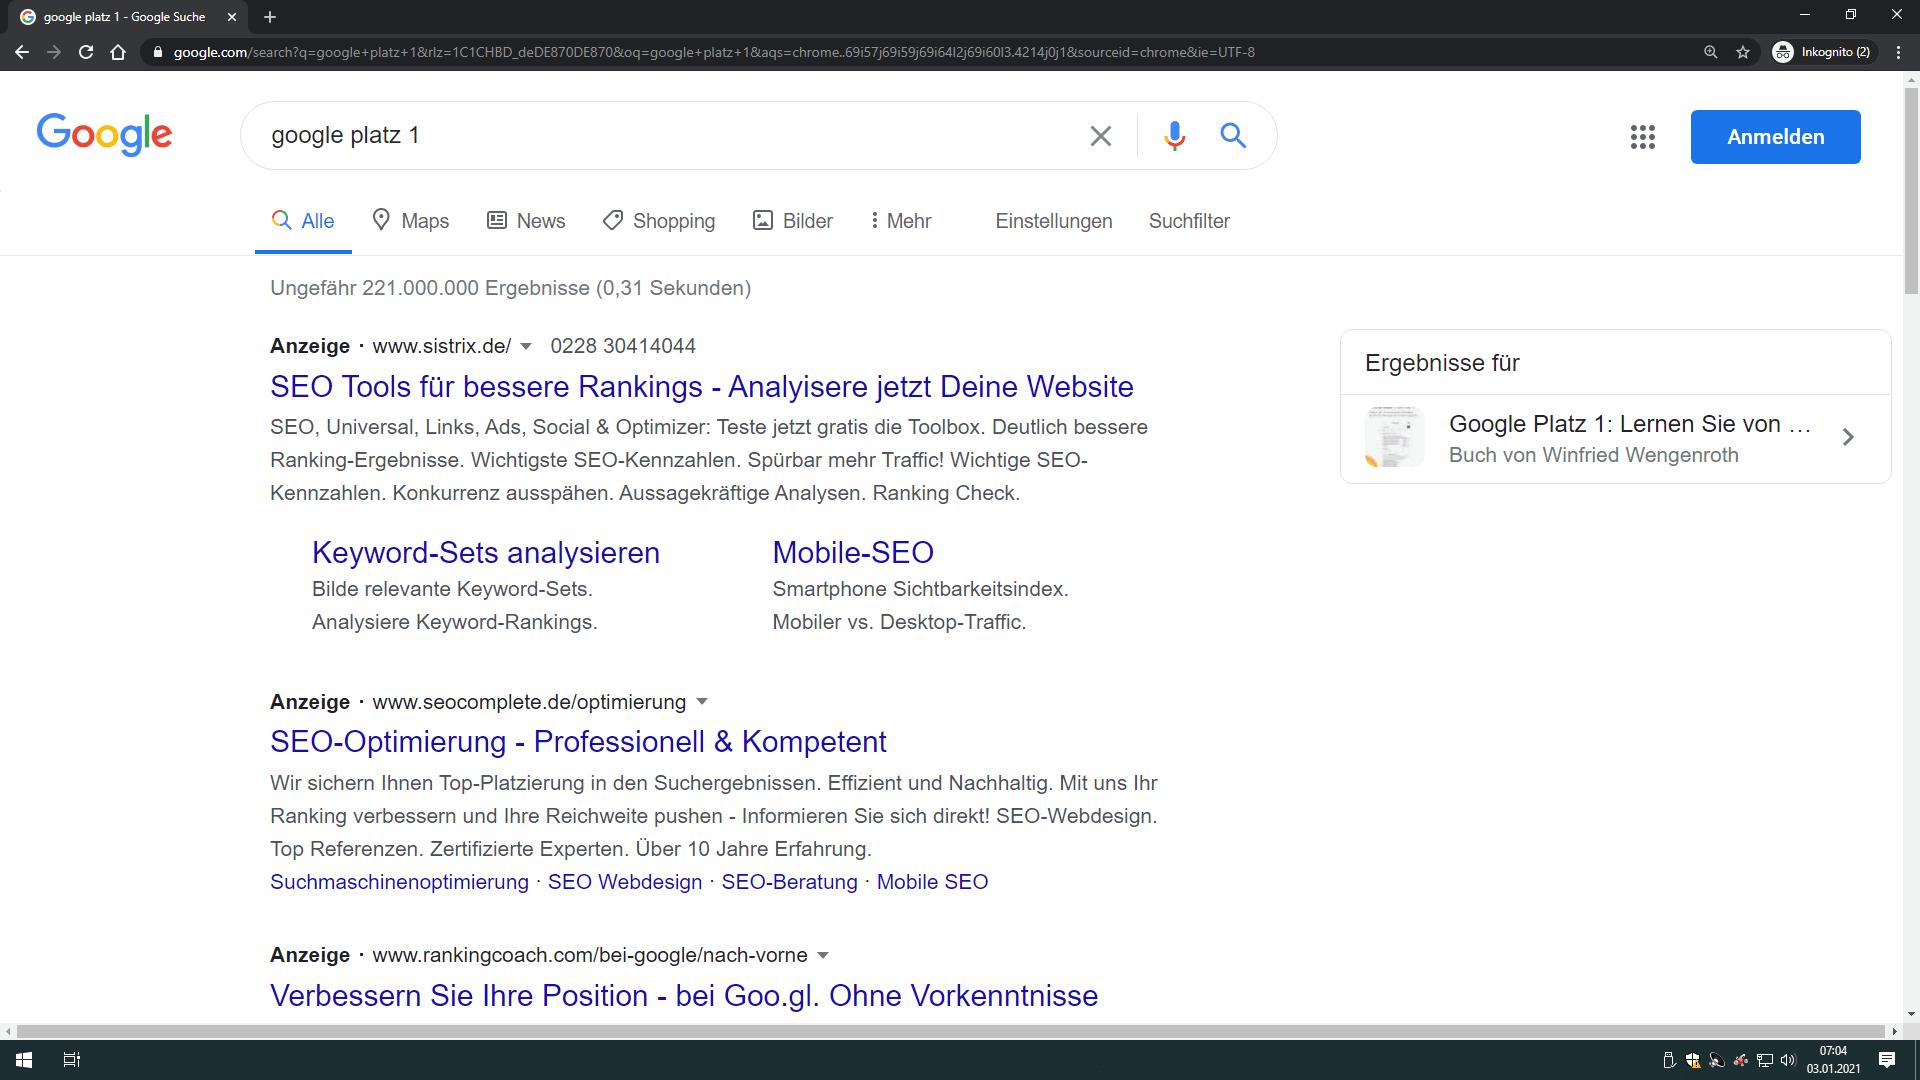 buchveroeffentlichung google platz 1 - desktop